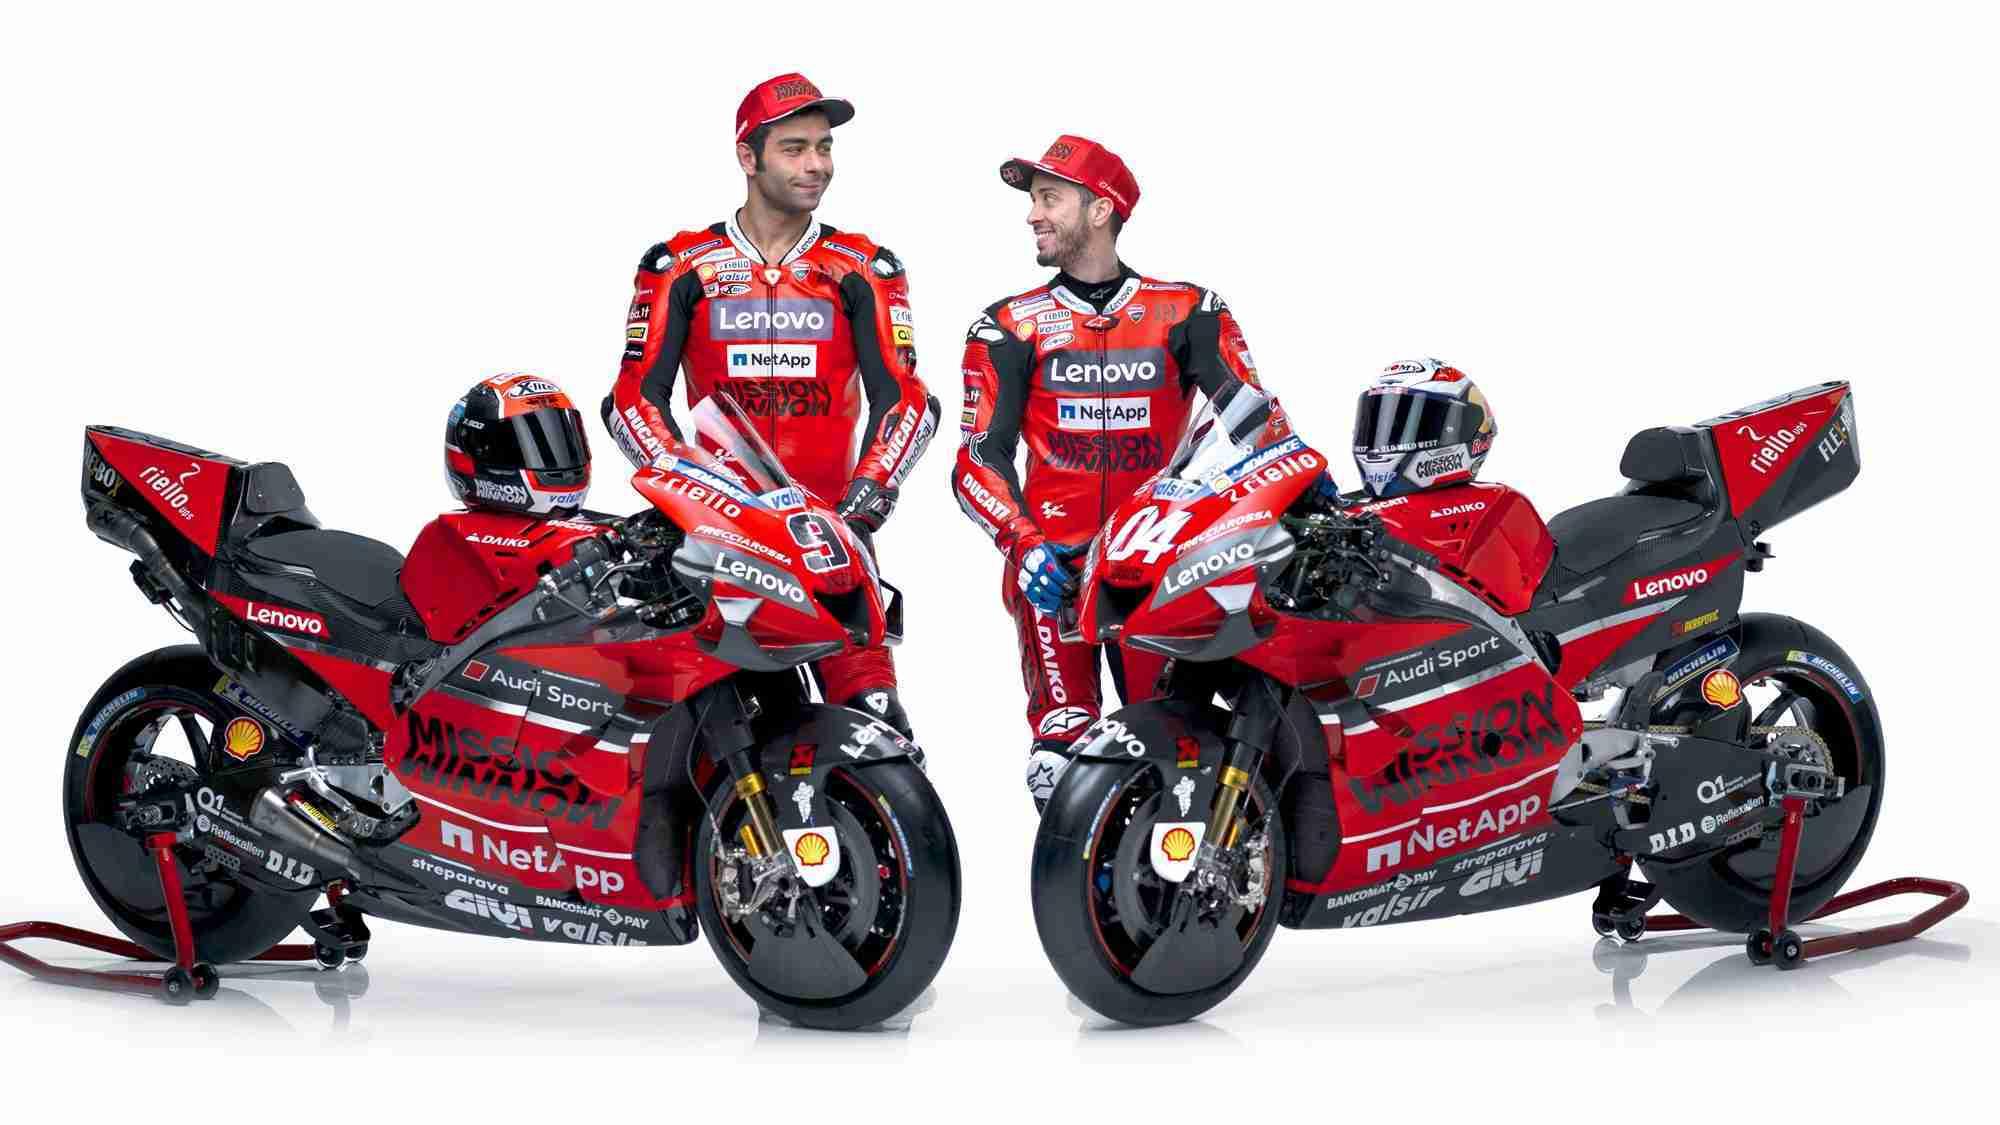 2020 Ducati MotoGP team and livery - Andrea Dovisiozo